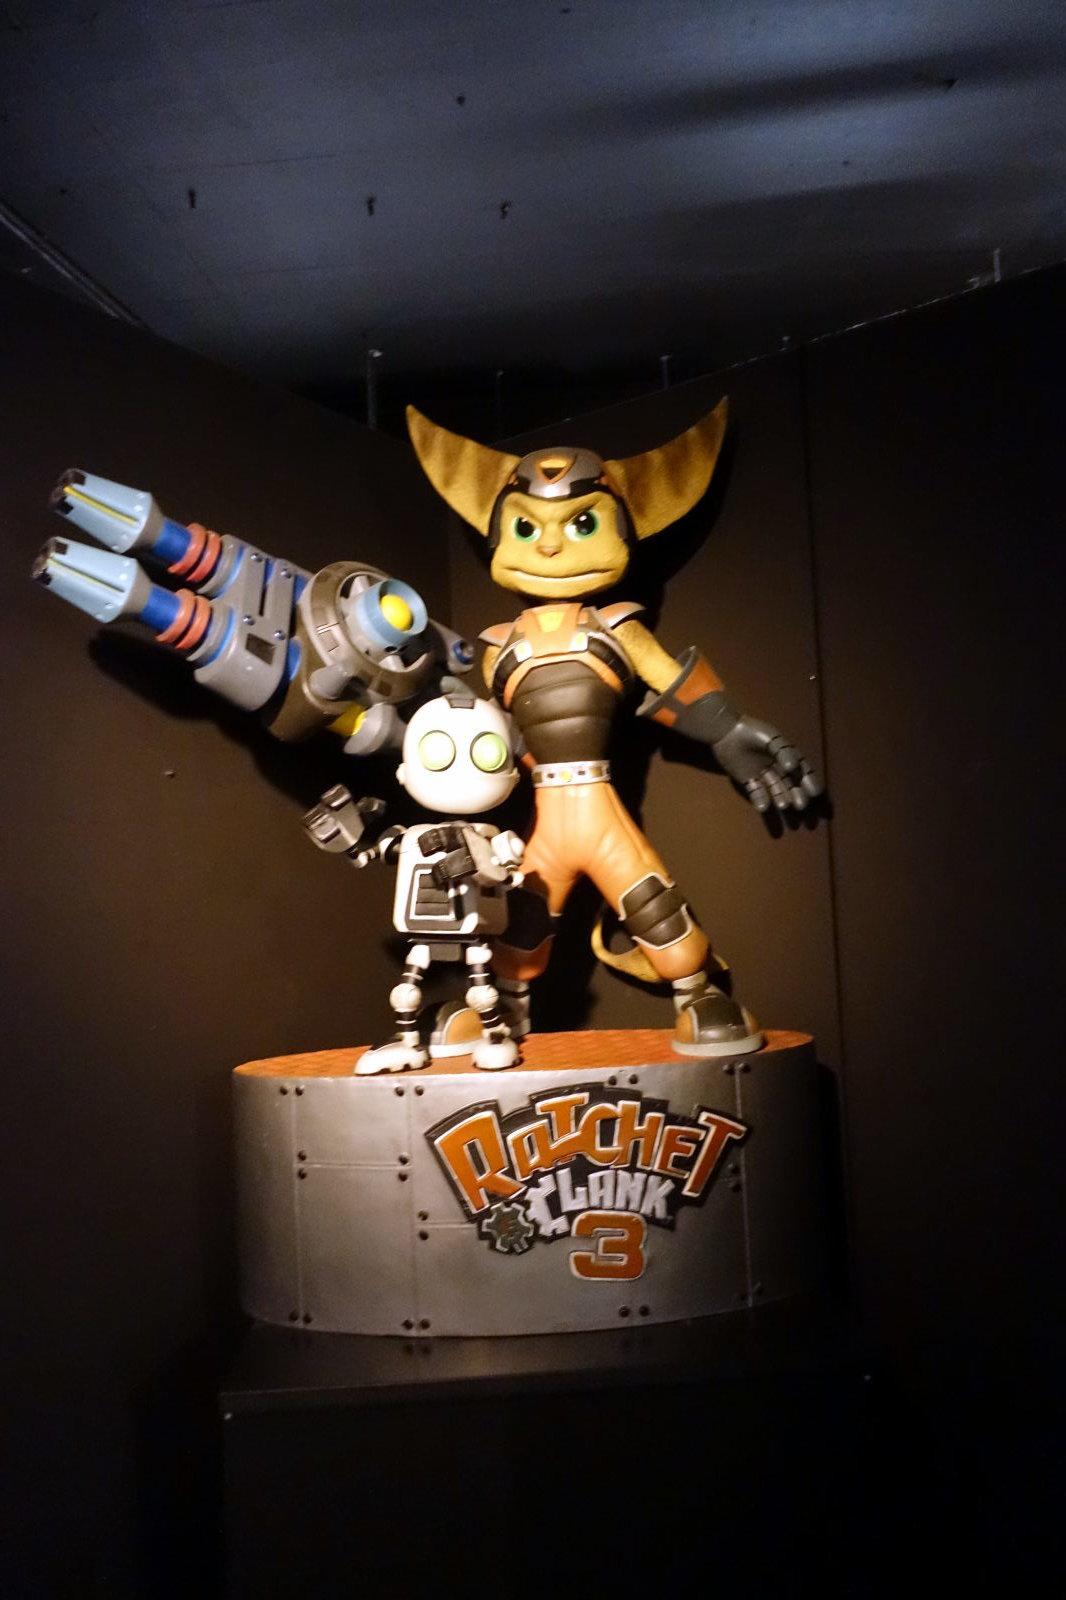 Ratchet & Clank figure